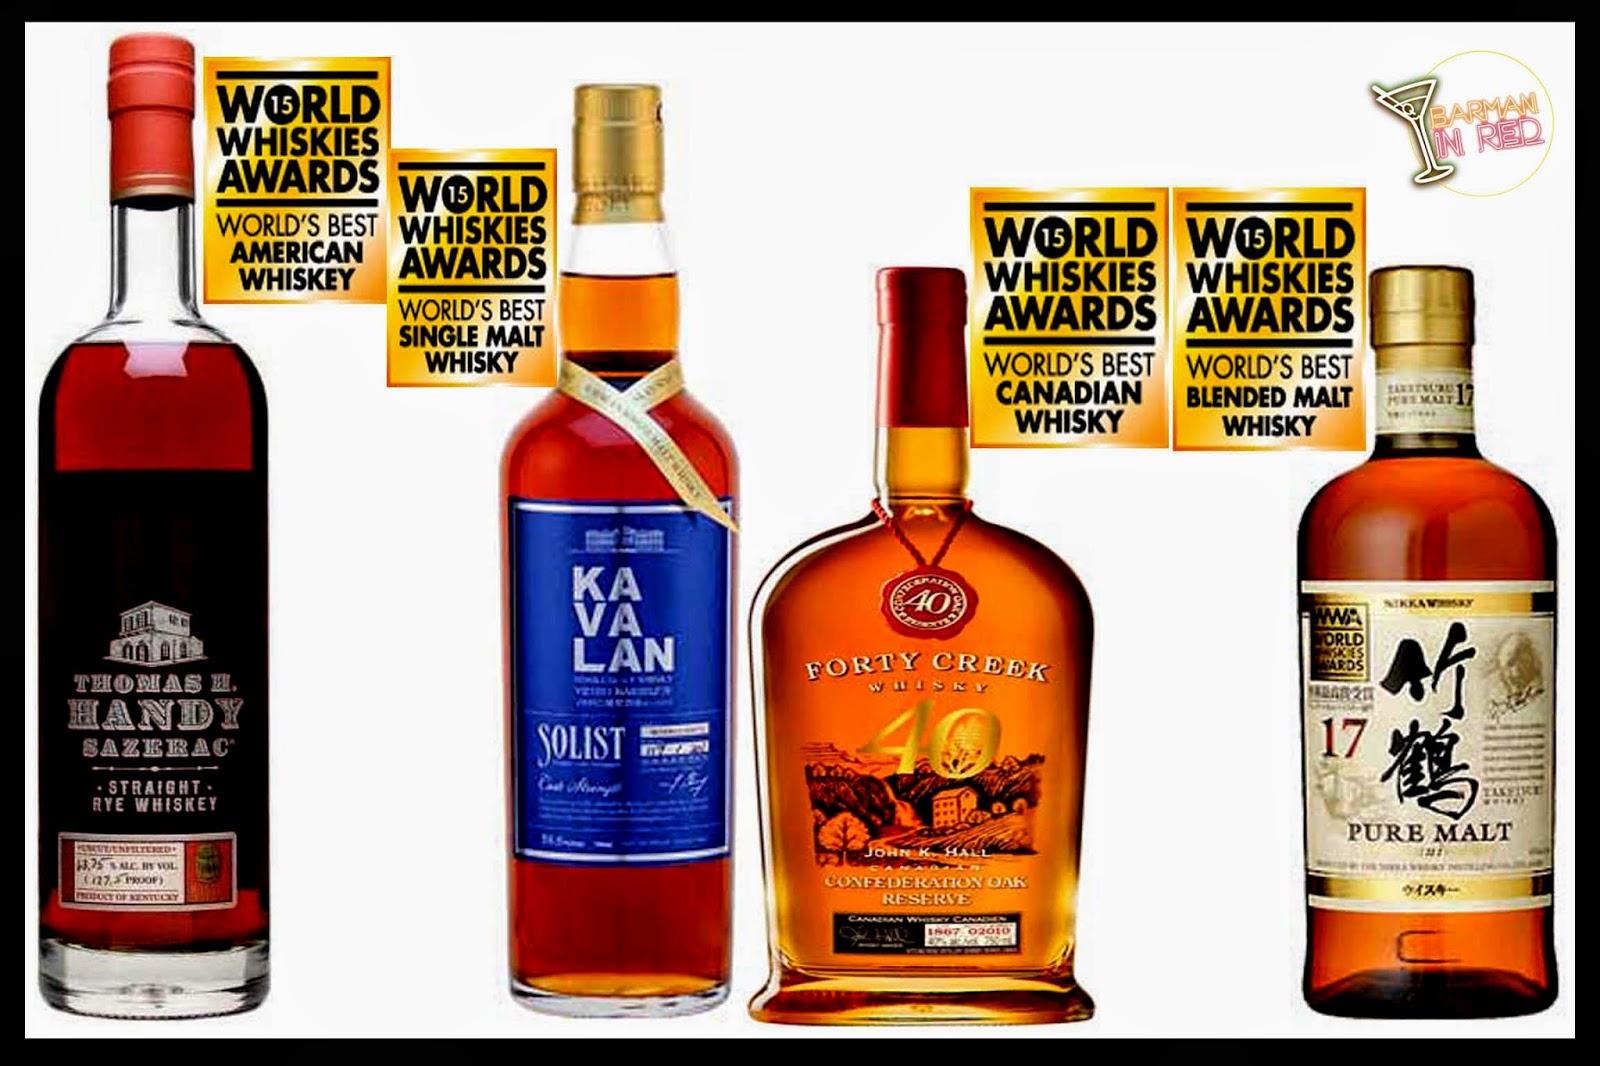 mejores whiskies del mundo 2015